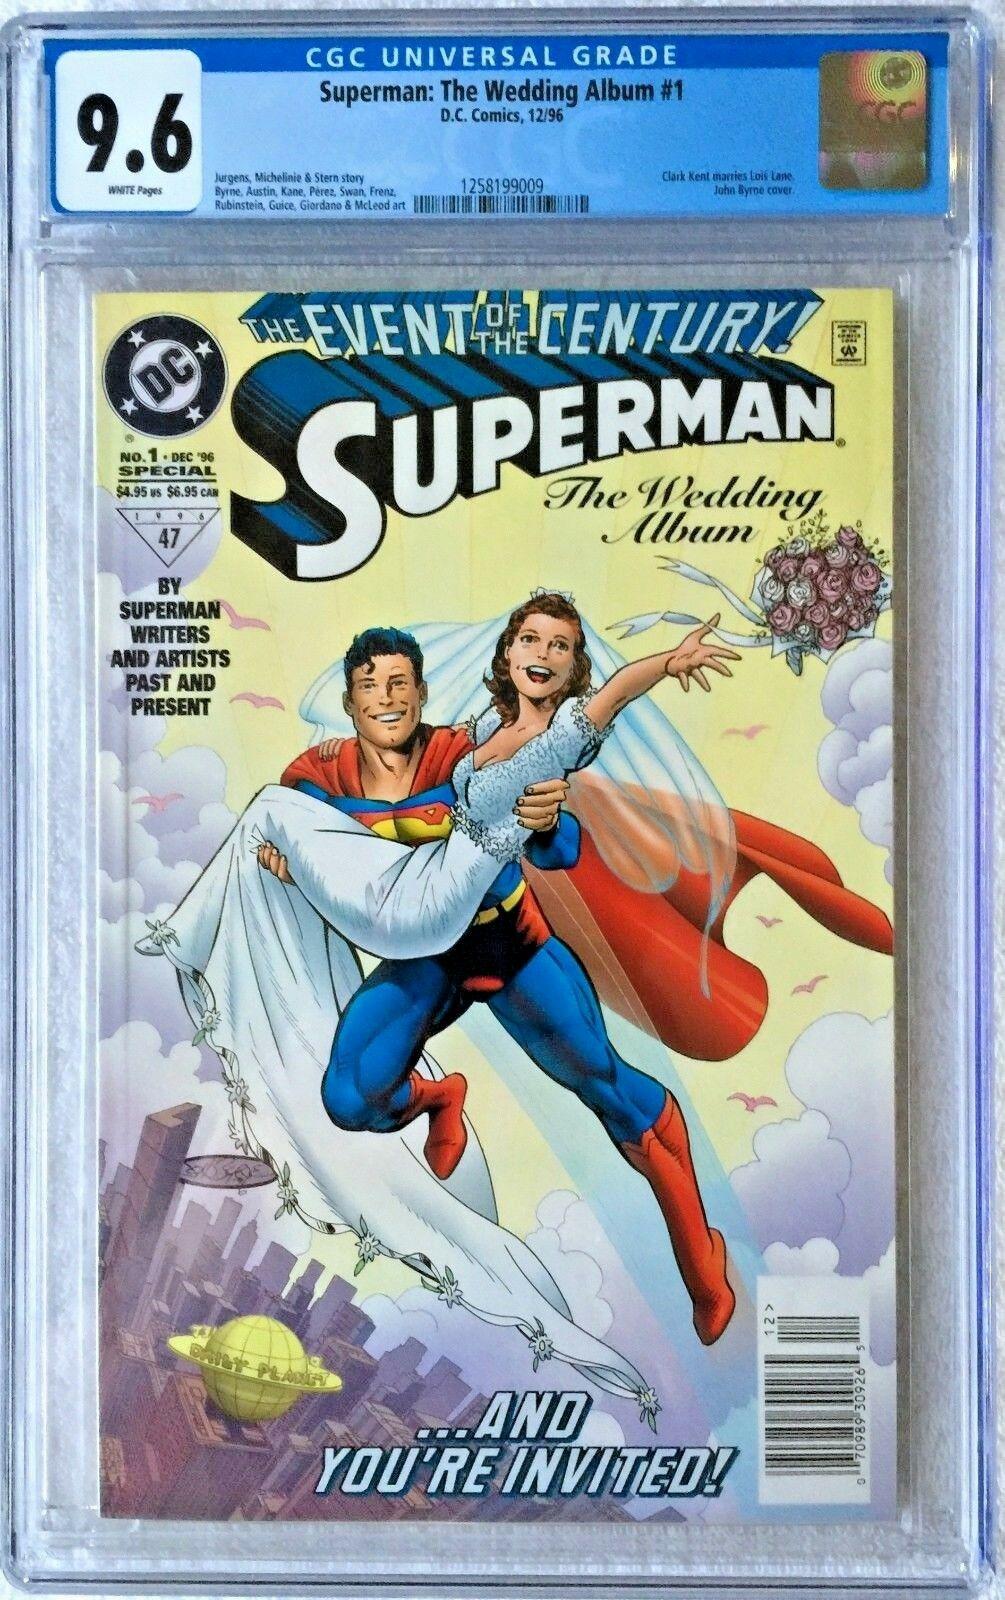 CGC 9.6 SUPERMAN: THE WEDDING ALBUM #1 .. SCARCE NEWSSTAND EDITION .. 1996 ..